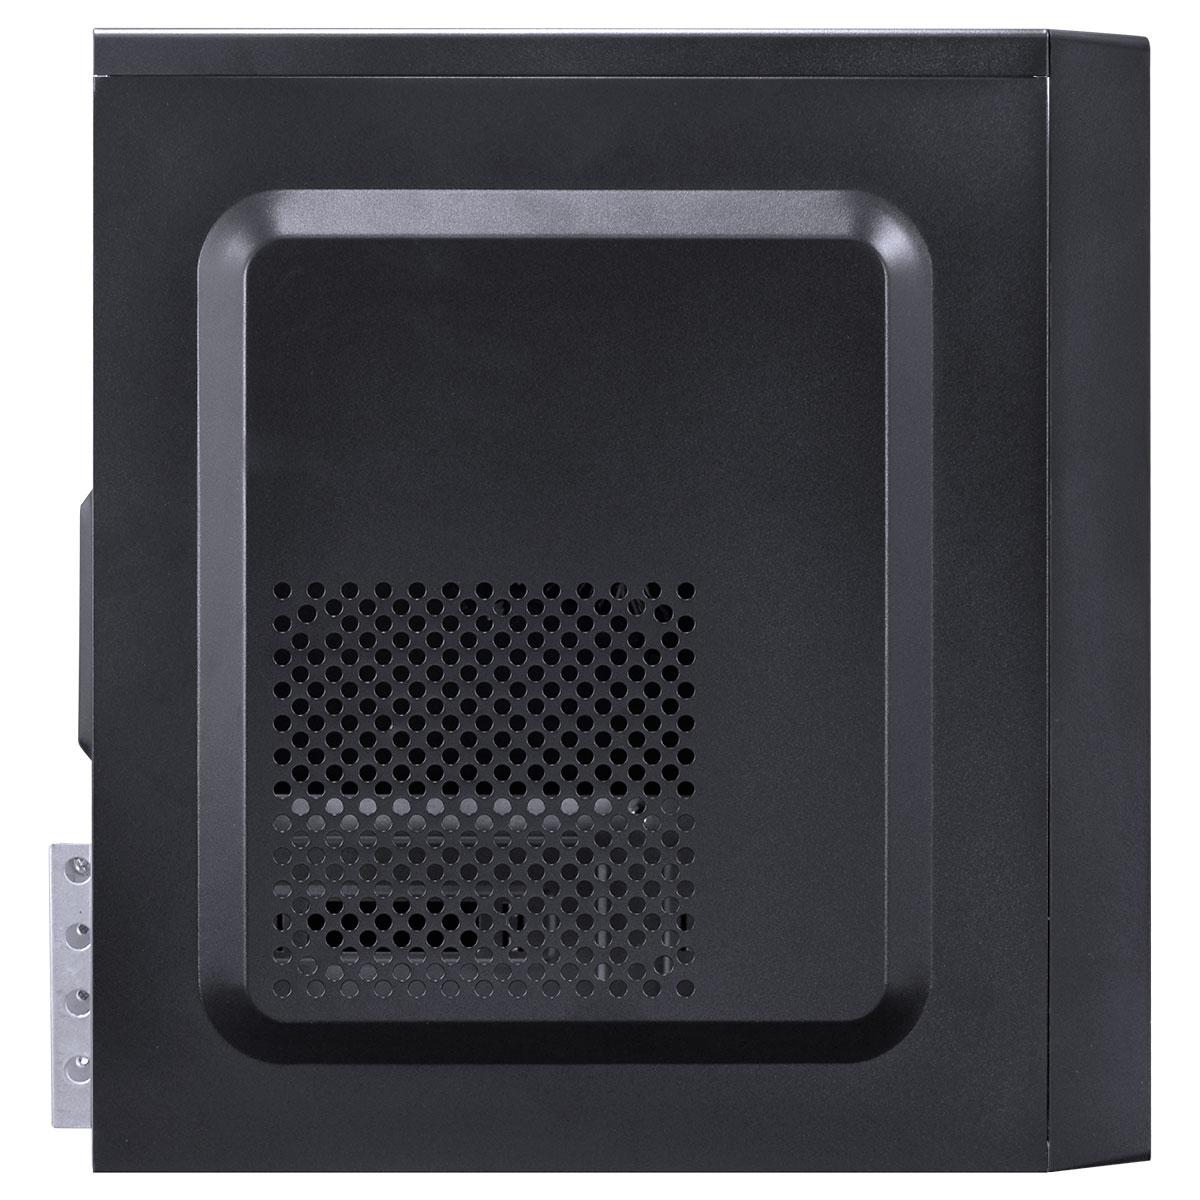 COMPUTADOR HOME H200 - PENTIUM DUAL CORE G5400 3.7GHZ MEM 4GB DDR4 HD 500GB HDMI/VGA FONTE 200W